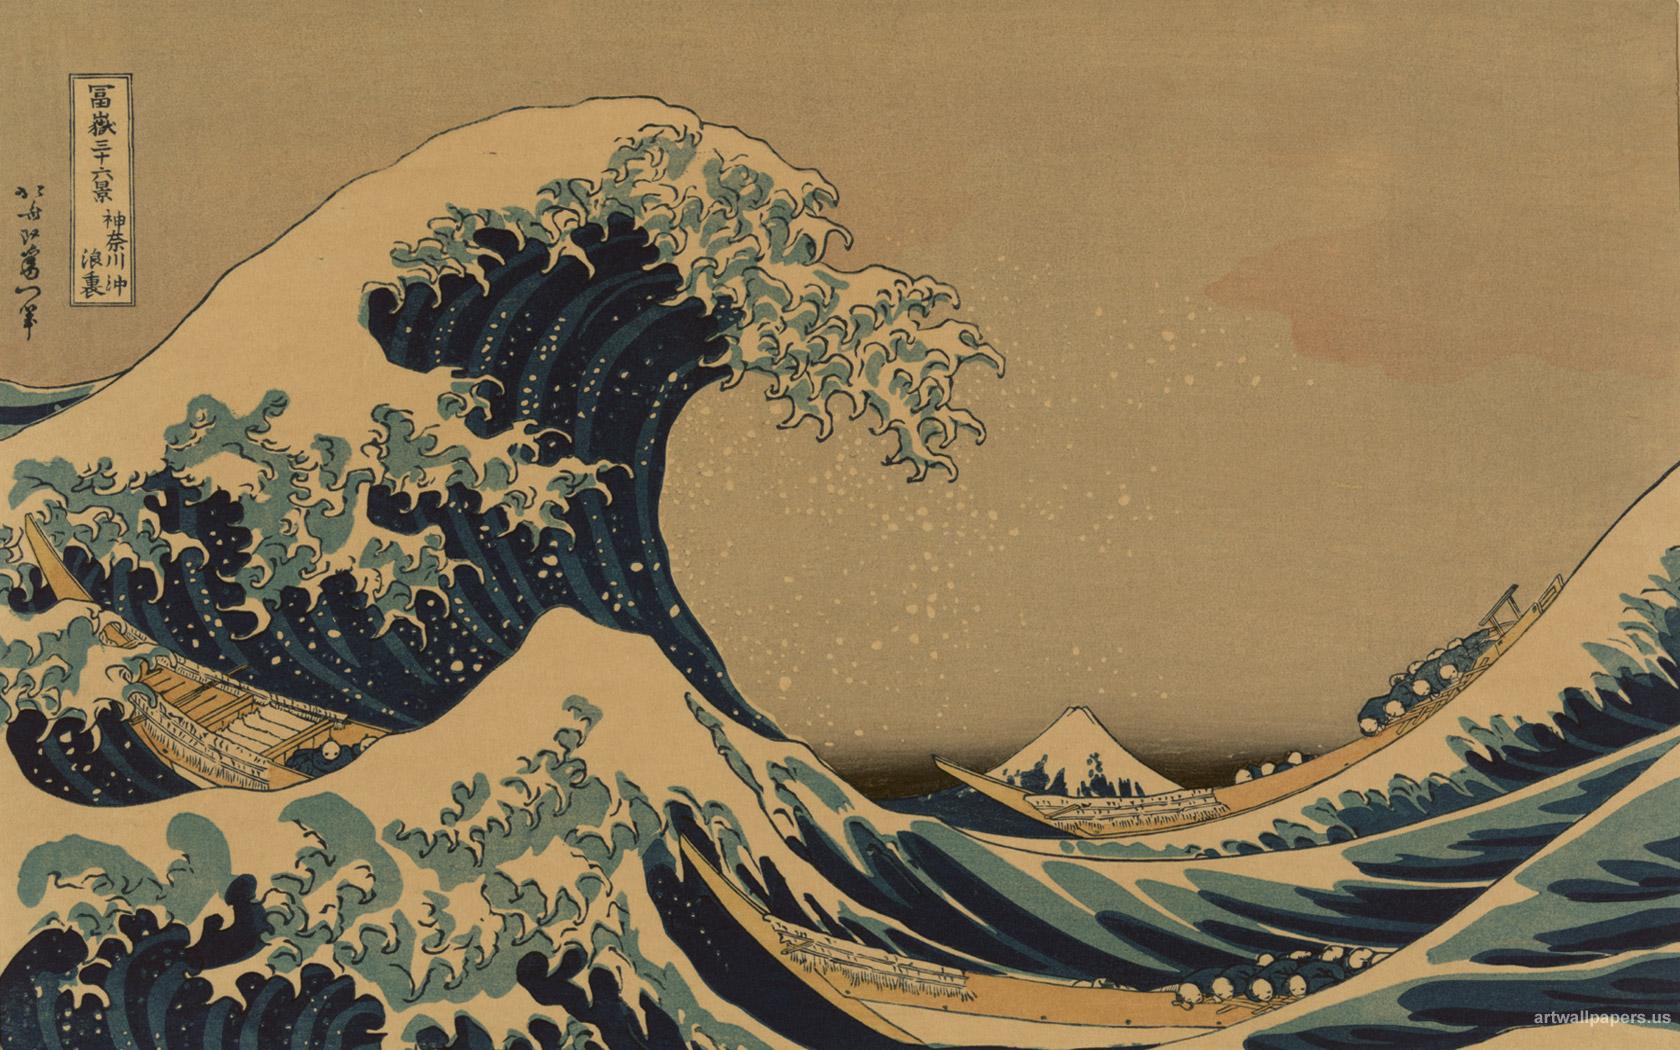 Hokusai Wallpaper The Great Wave at Kanagawa Art Print Wallpapers 1680x1050